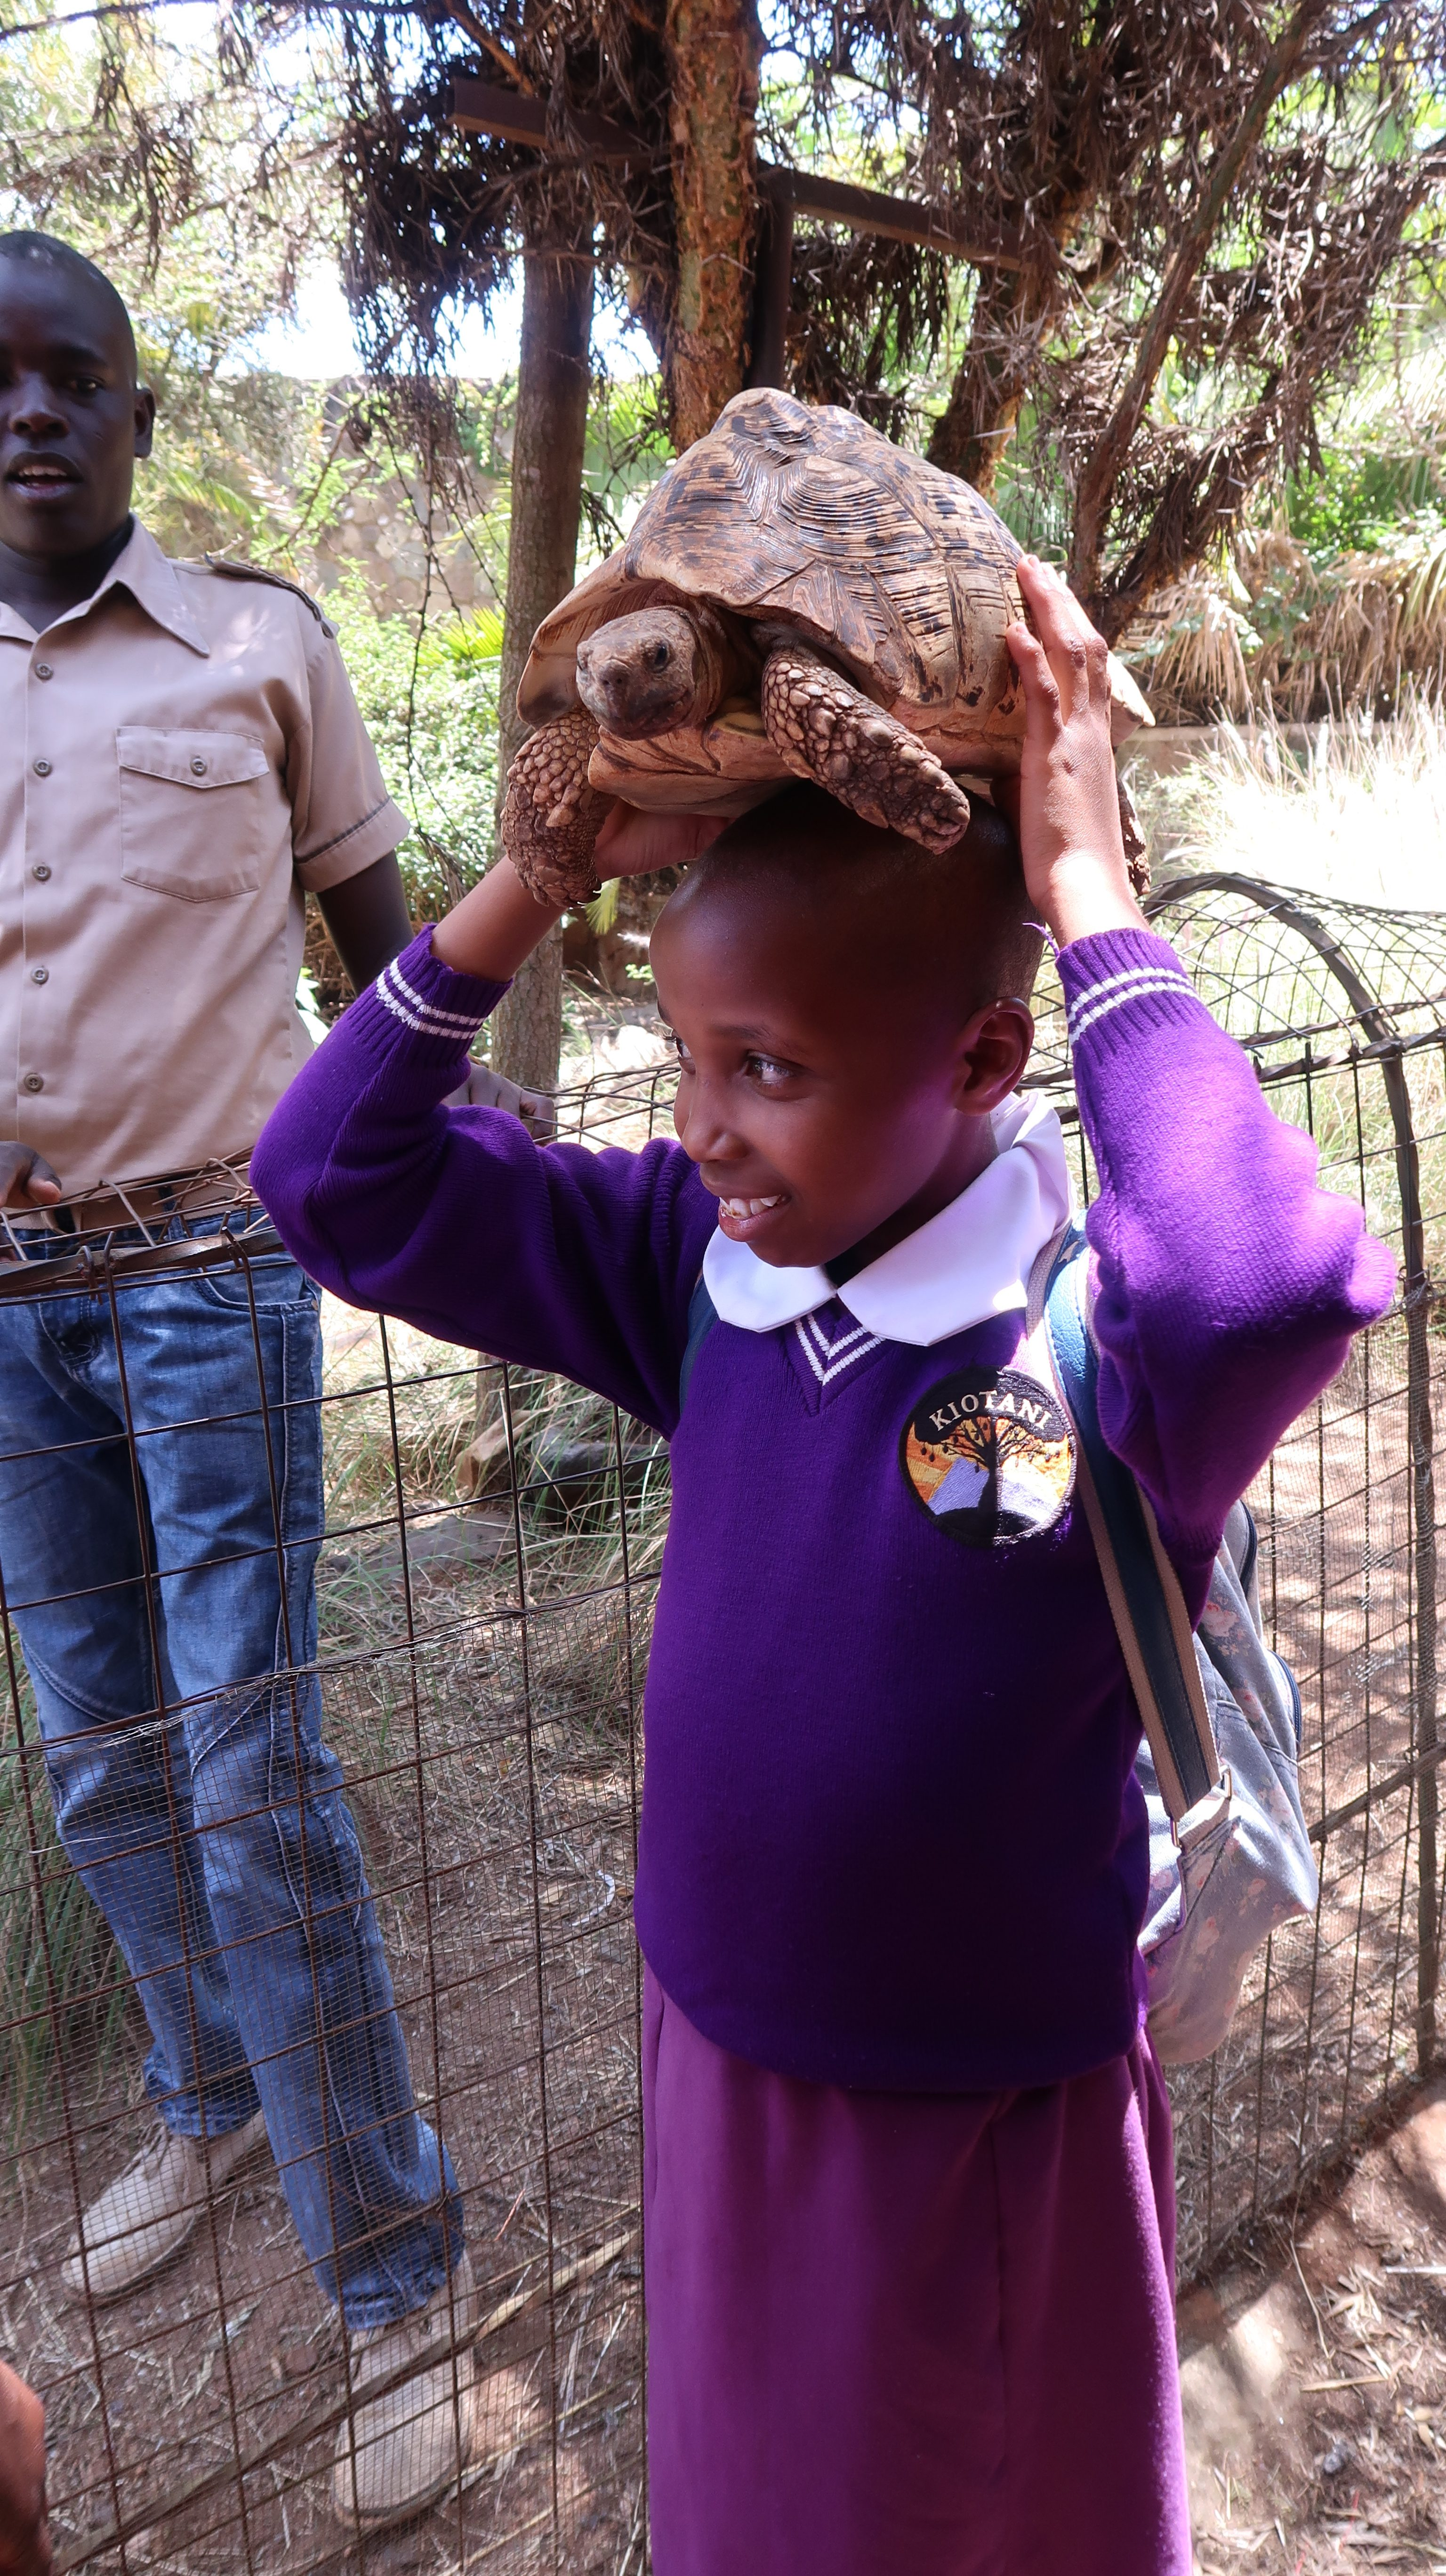 Sköldpaddor i Mamba Village Nairobi